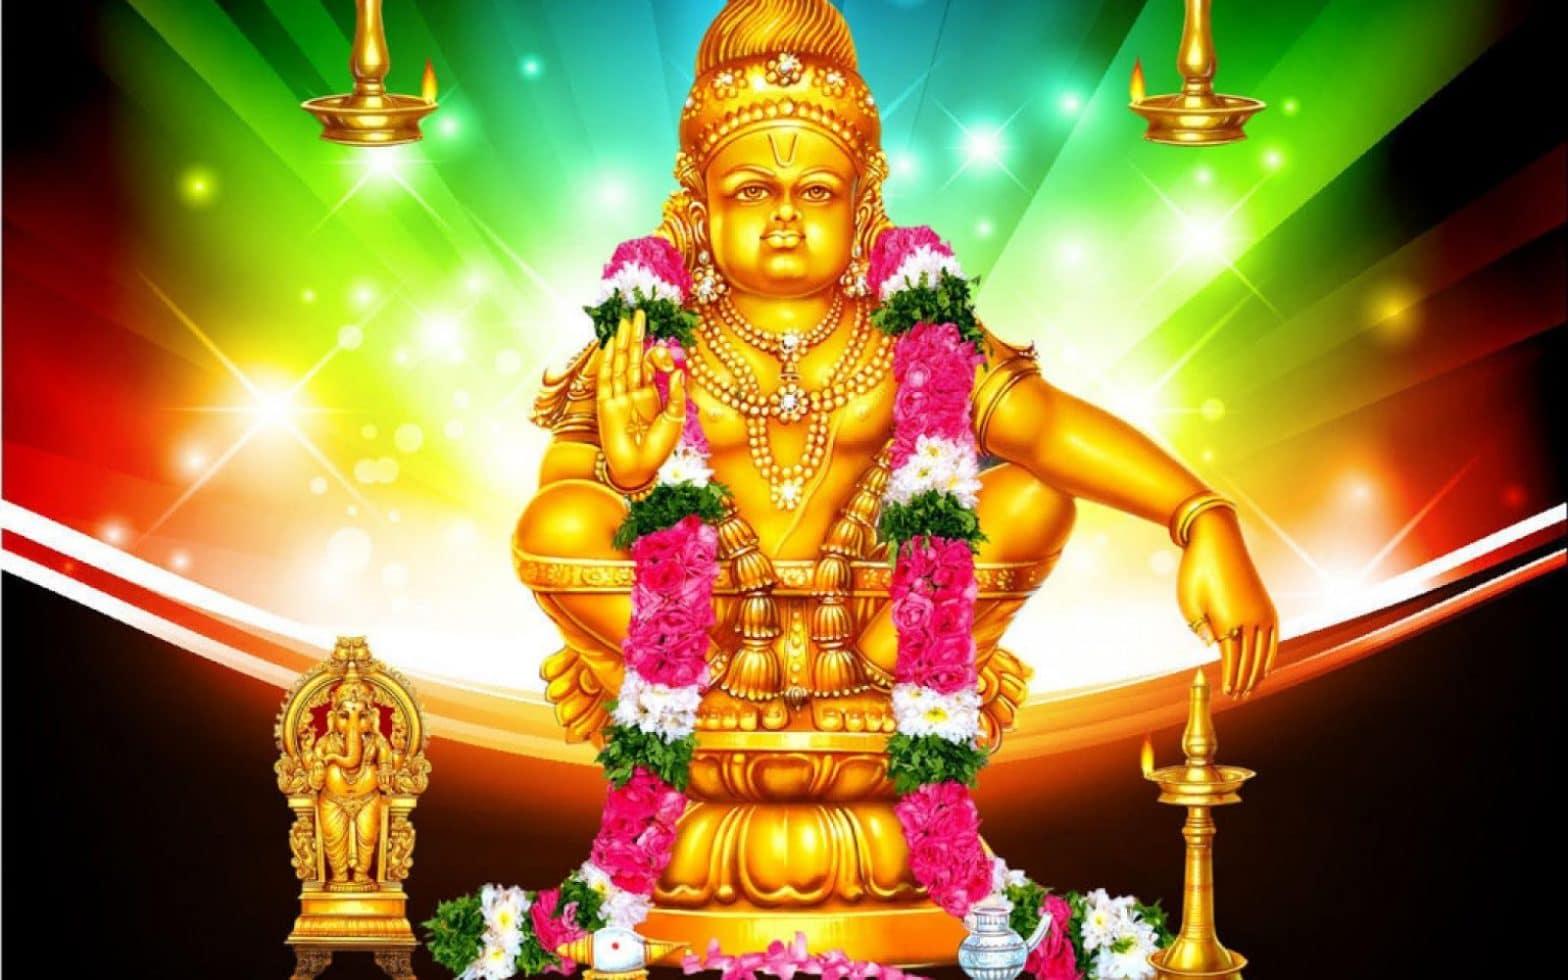 Sri Hariharaputra Ashtottara